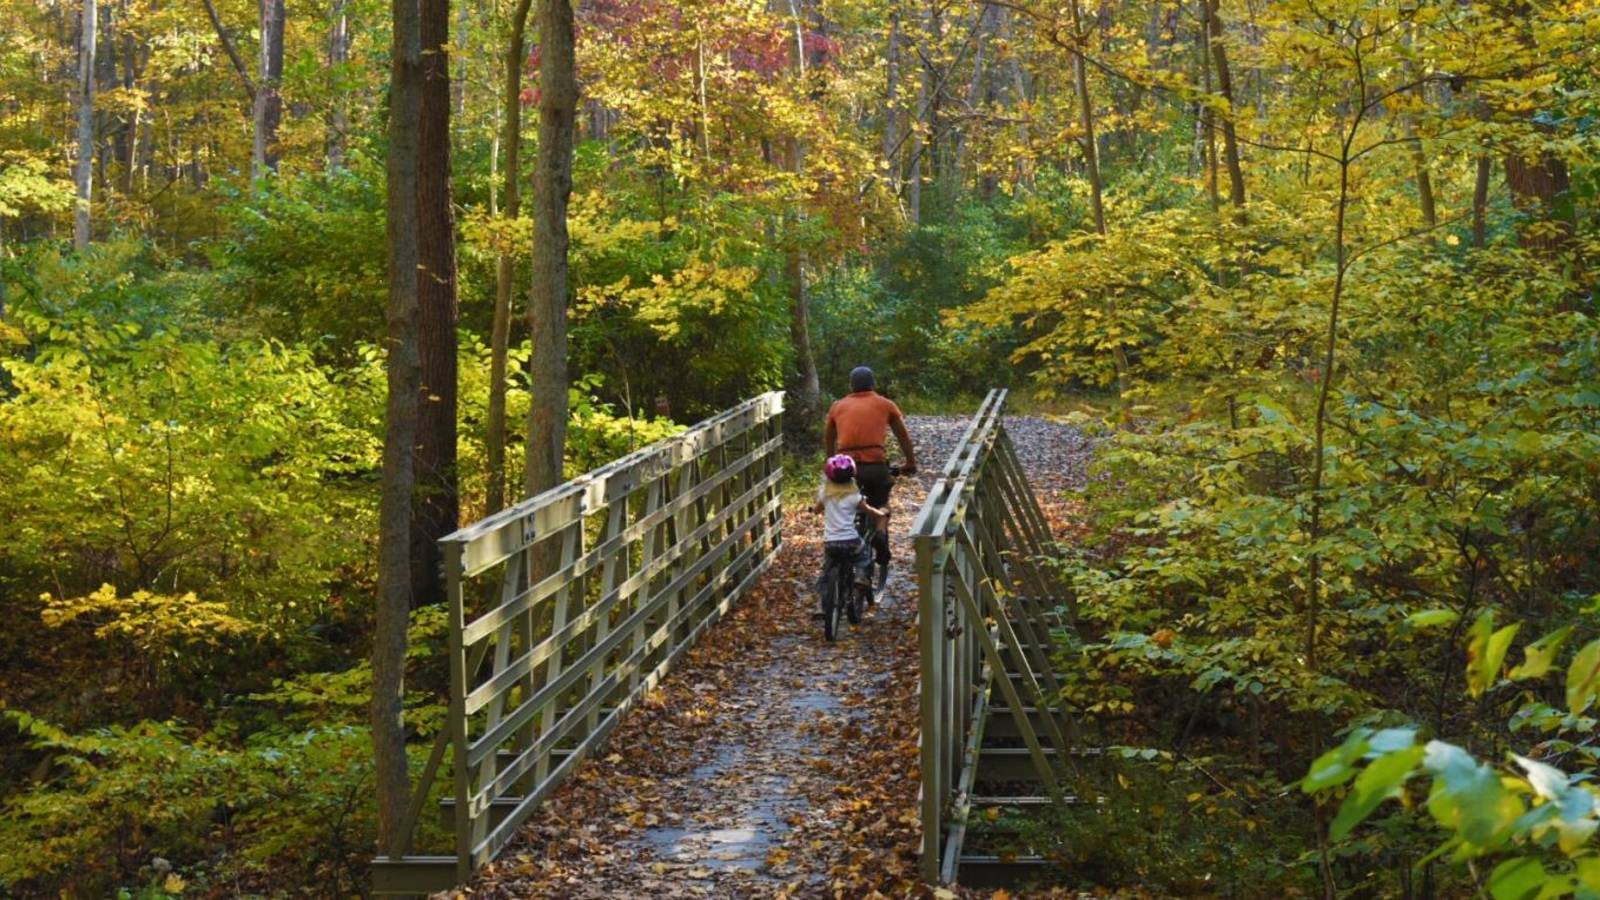 <p>McDade Recreational Trail, Delaware Water Gap National Recreation Area, East Stroudsburg, PA.</p>